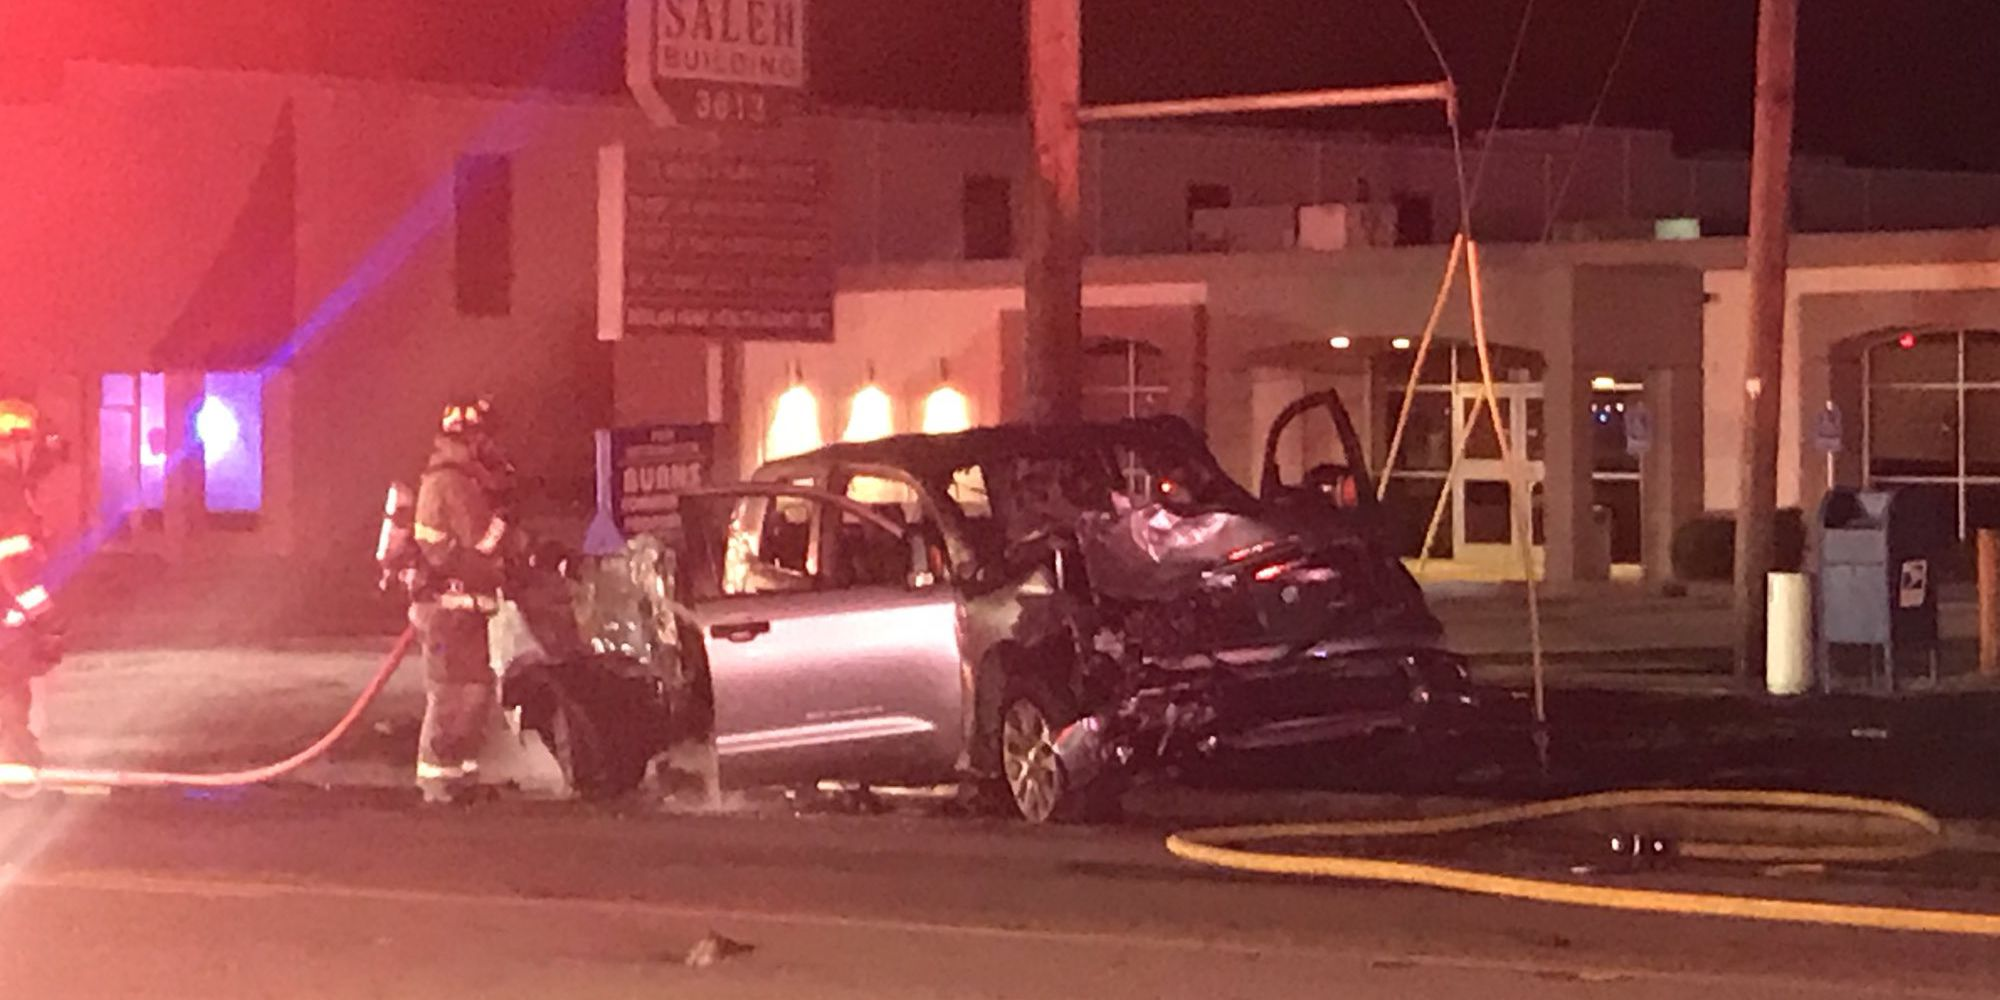 Tyler police identify motorcyclist killed in overnight fiery crash